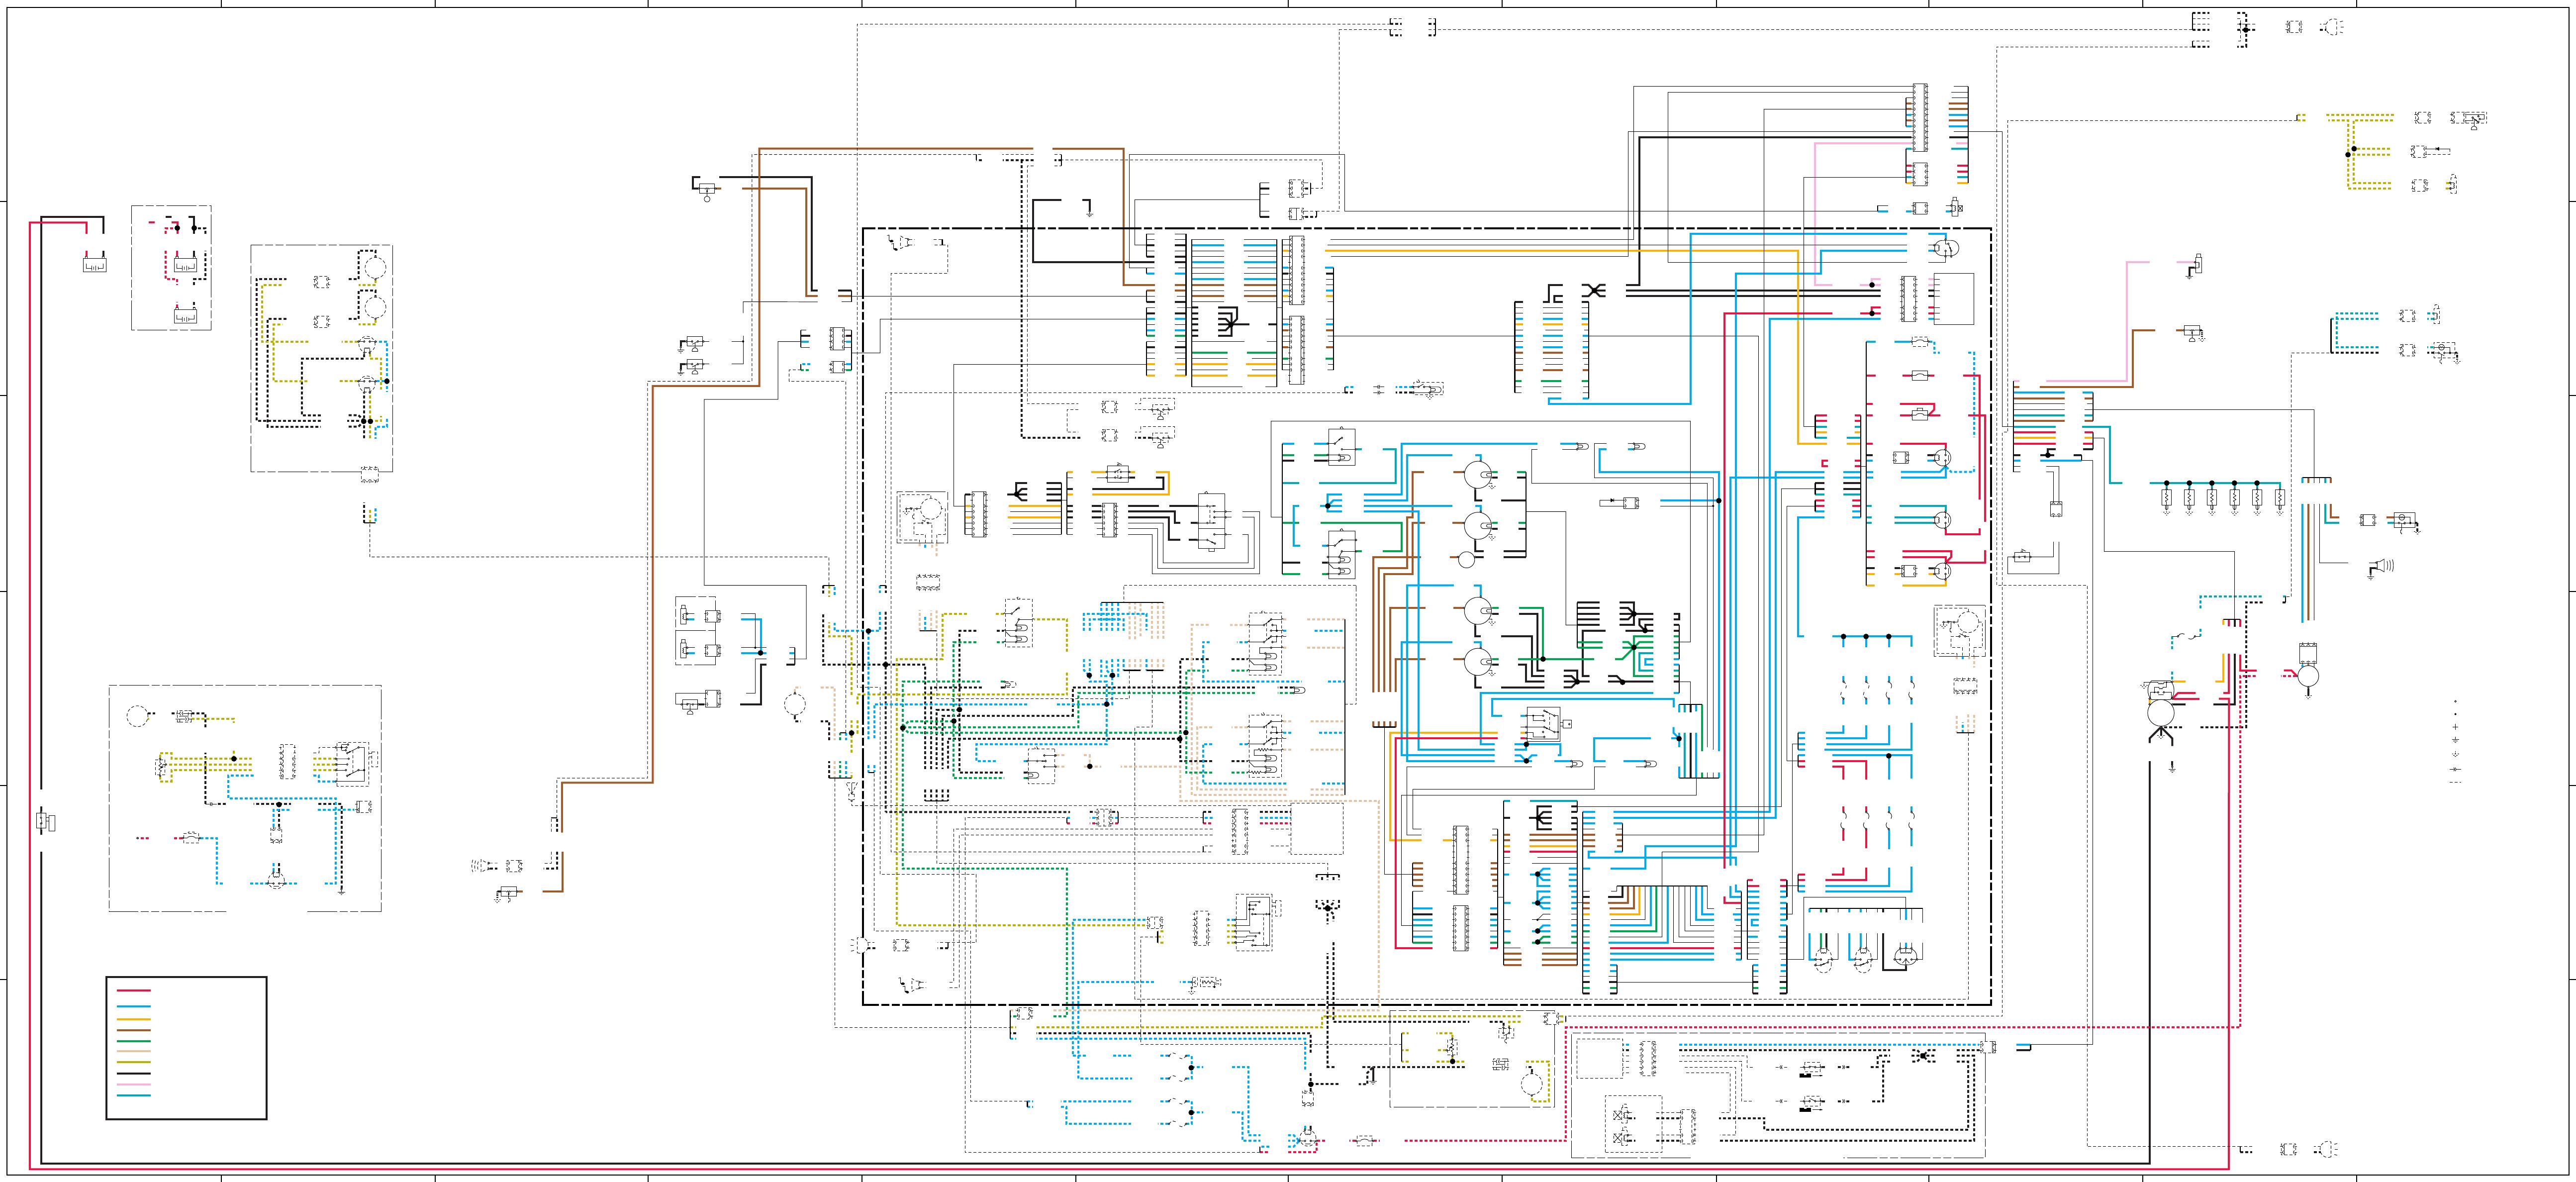 D3c D4c D5c Iii 933c 939c Hystat Electrical Schematic Cat Machines Electrical Schematic